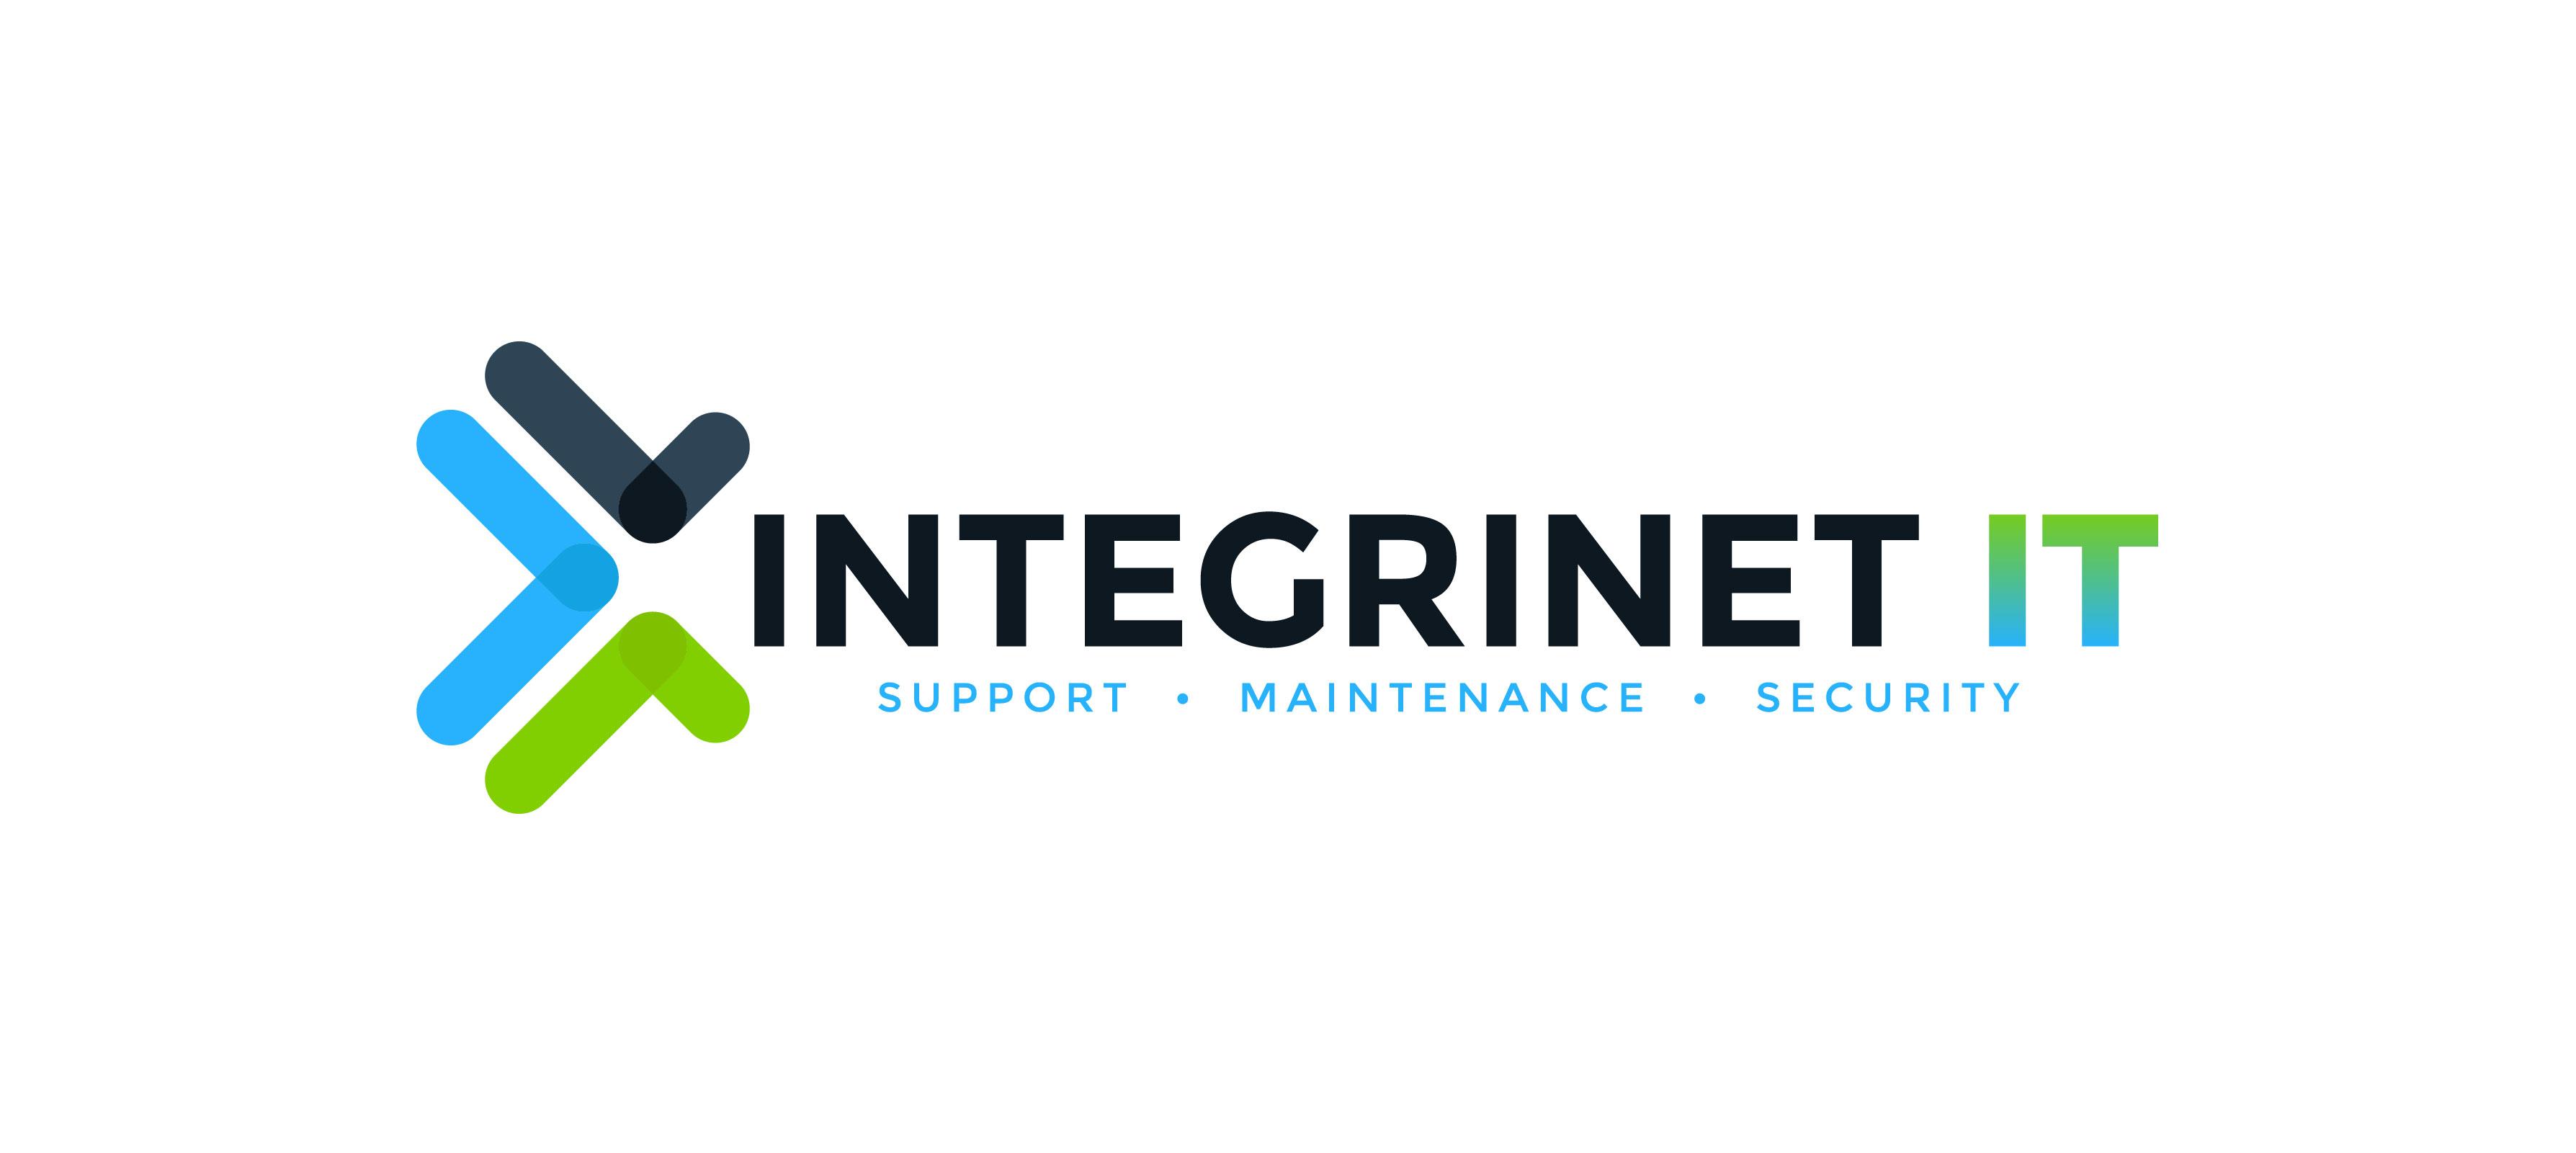 Integrinet IT